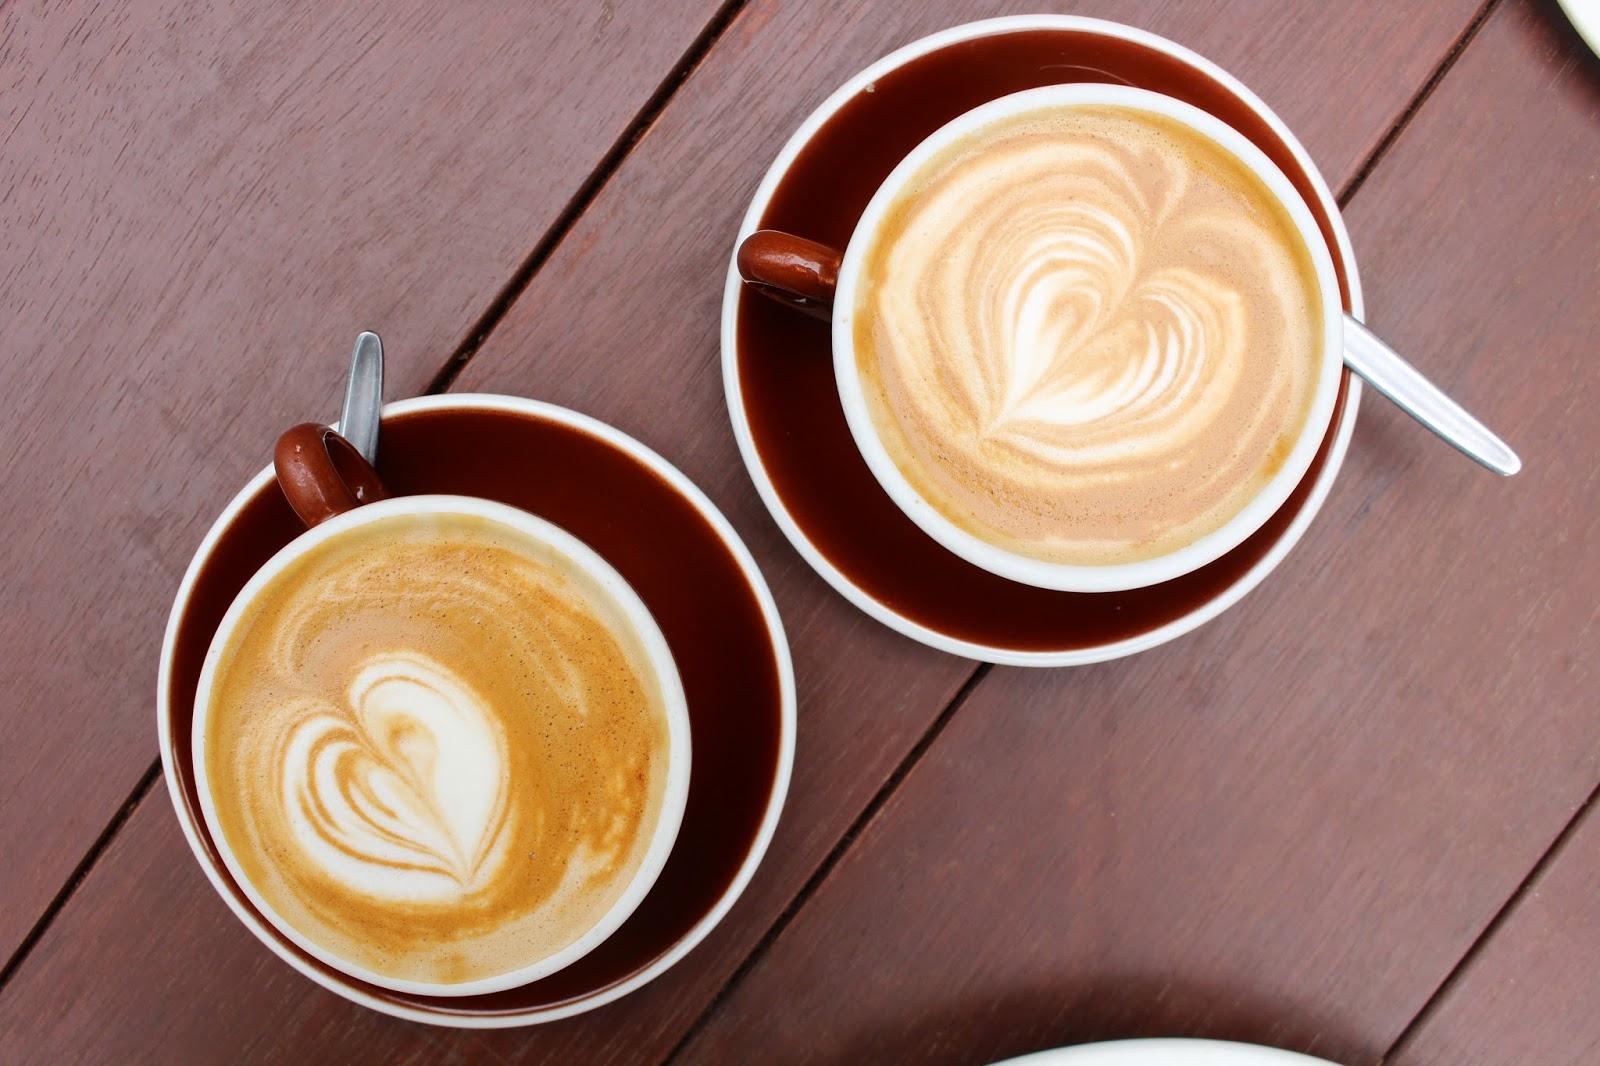 New Zealand South Island food & coffee hotspots